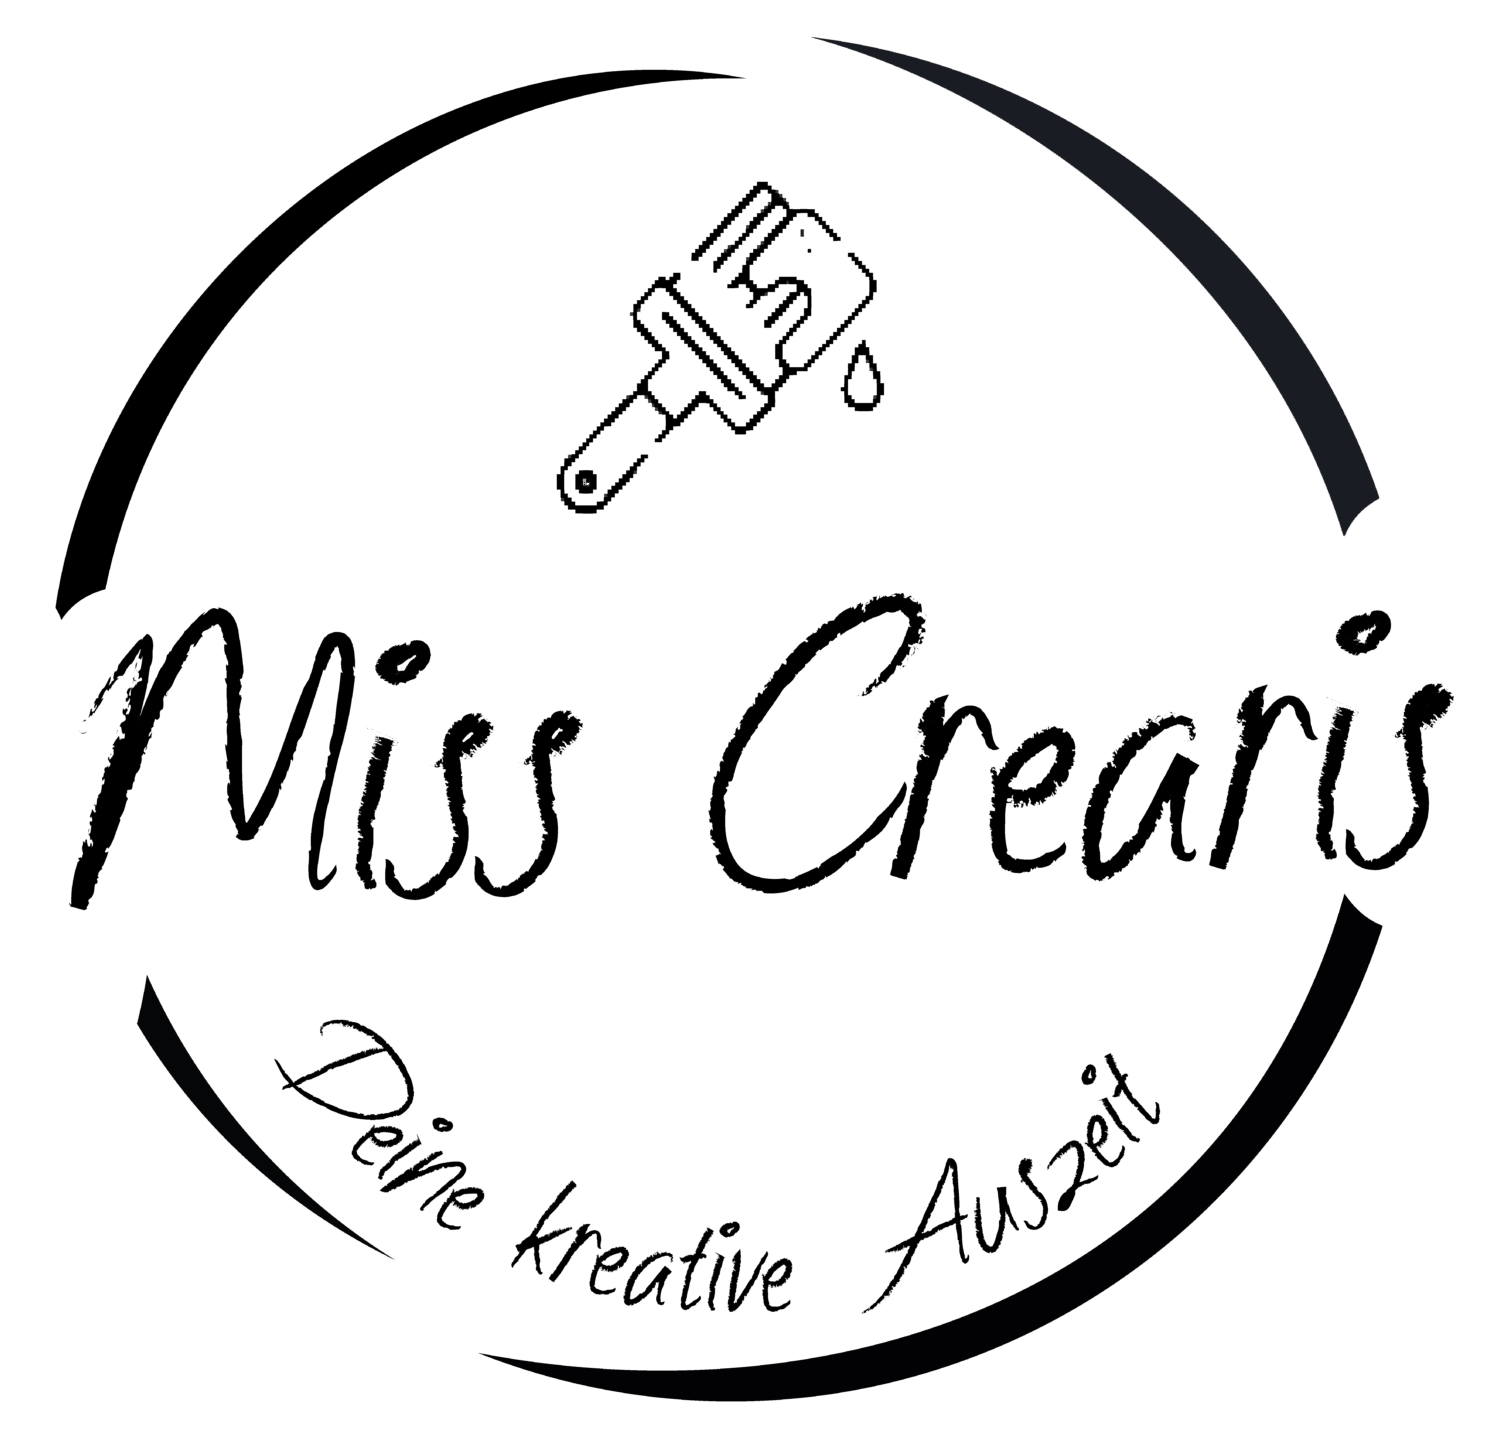 Misscrearis